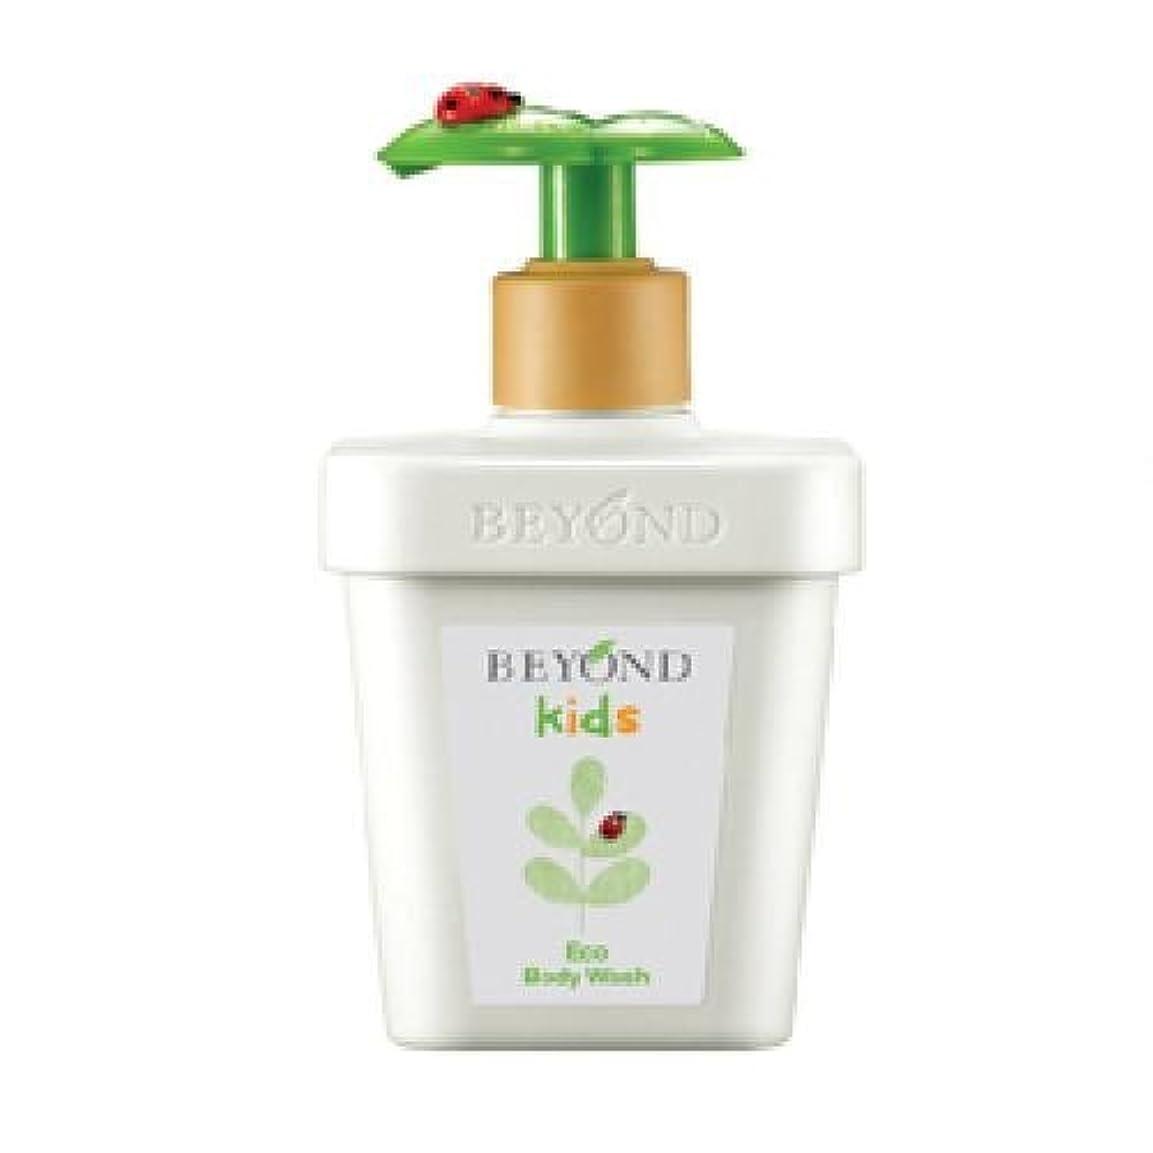 BEYOND Kids Eco Body Wash [Korean Import]